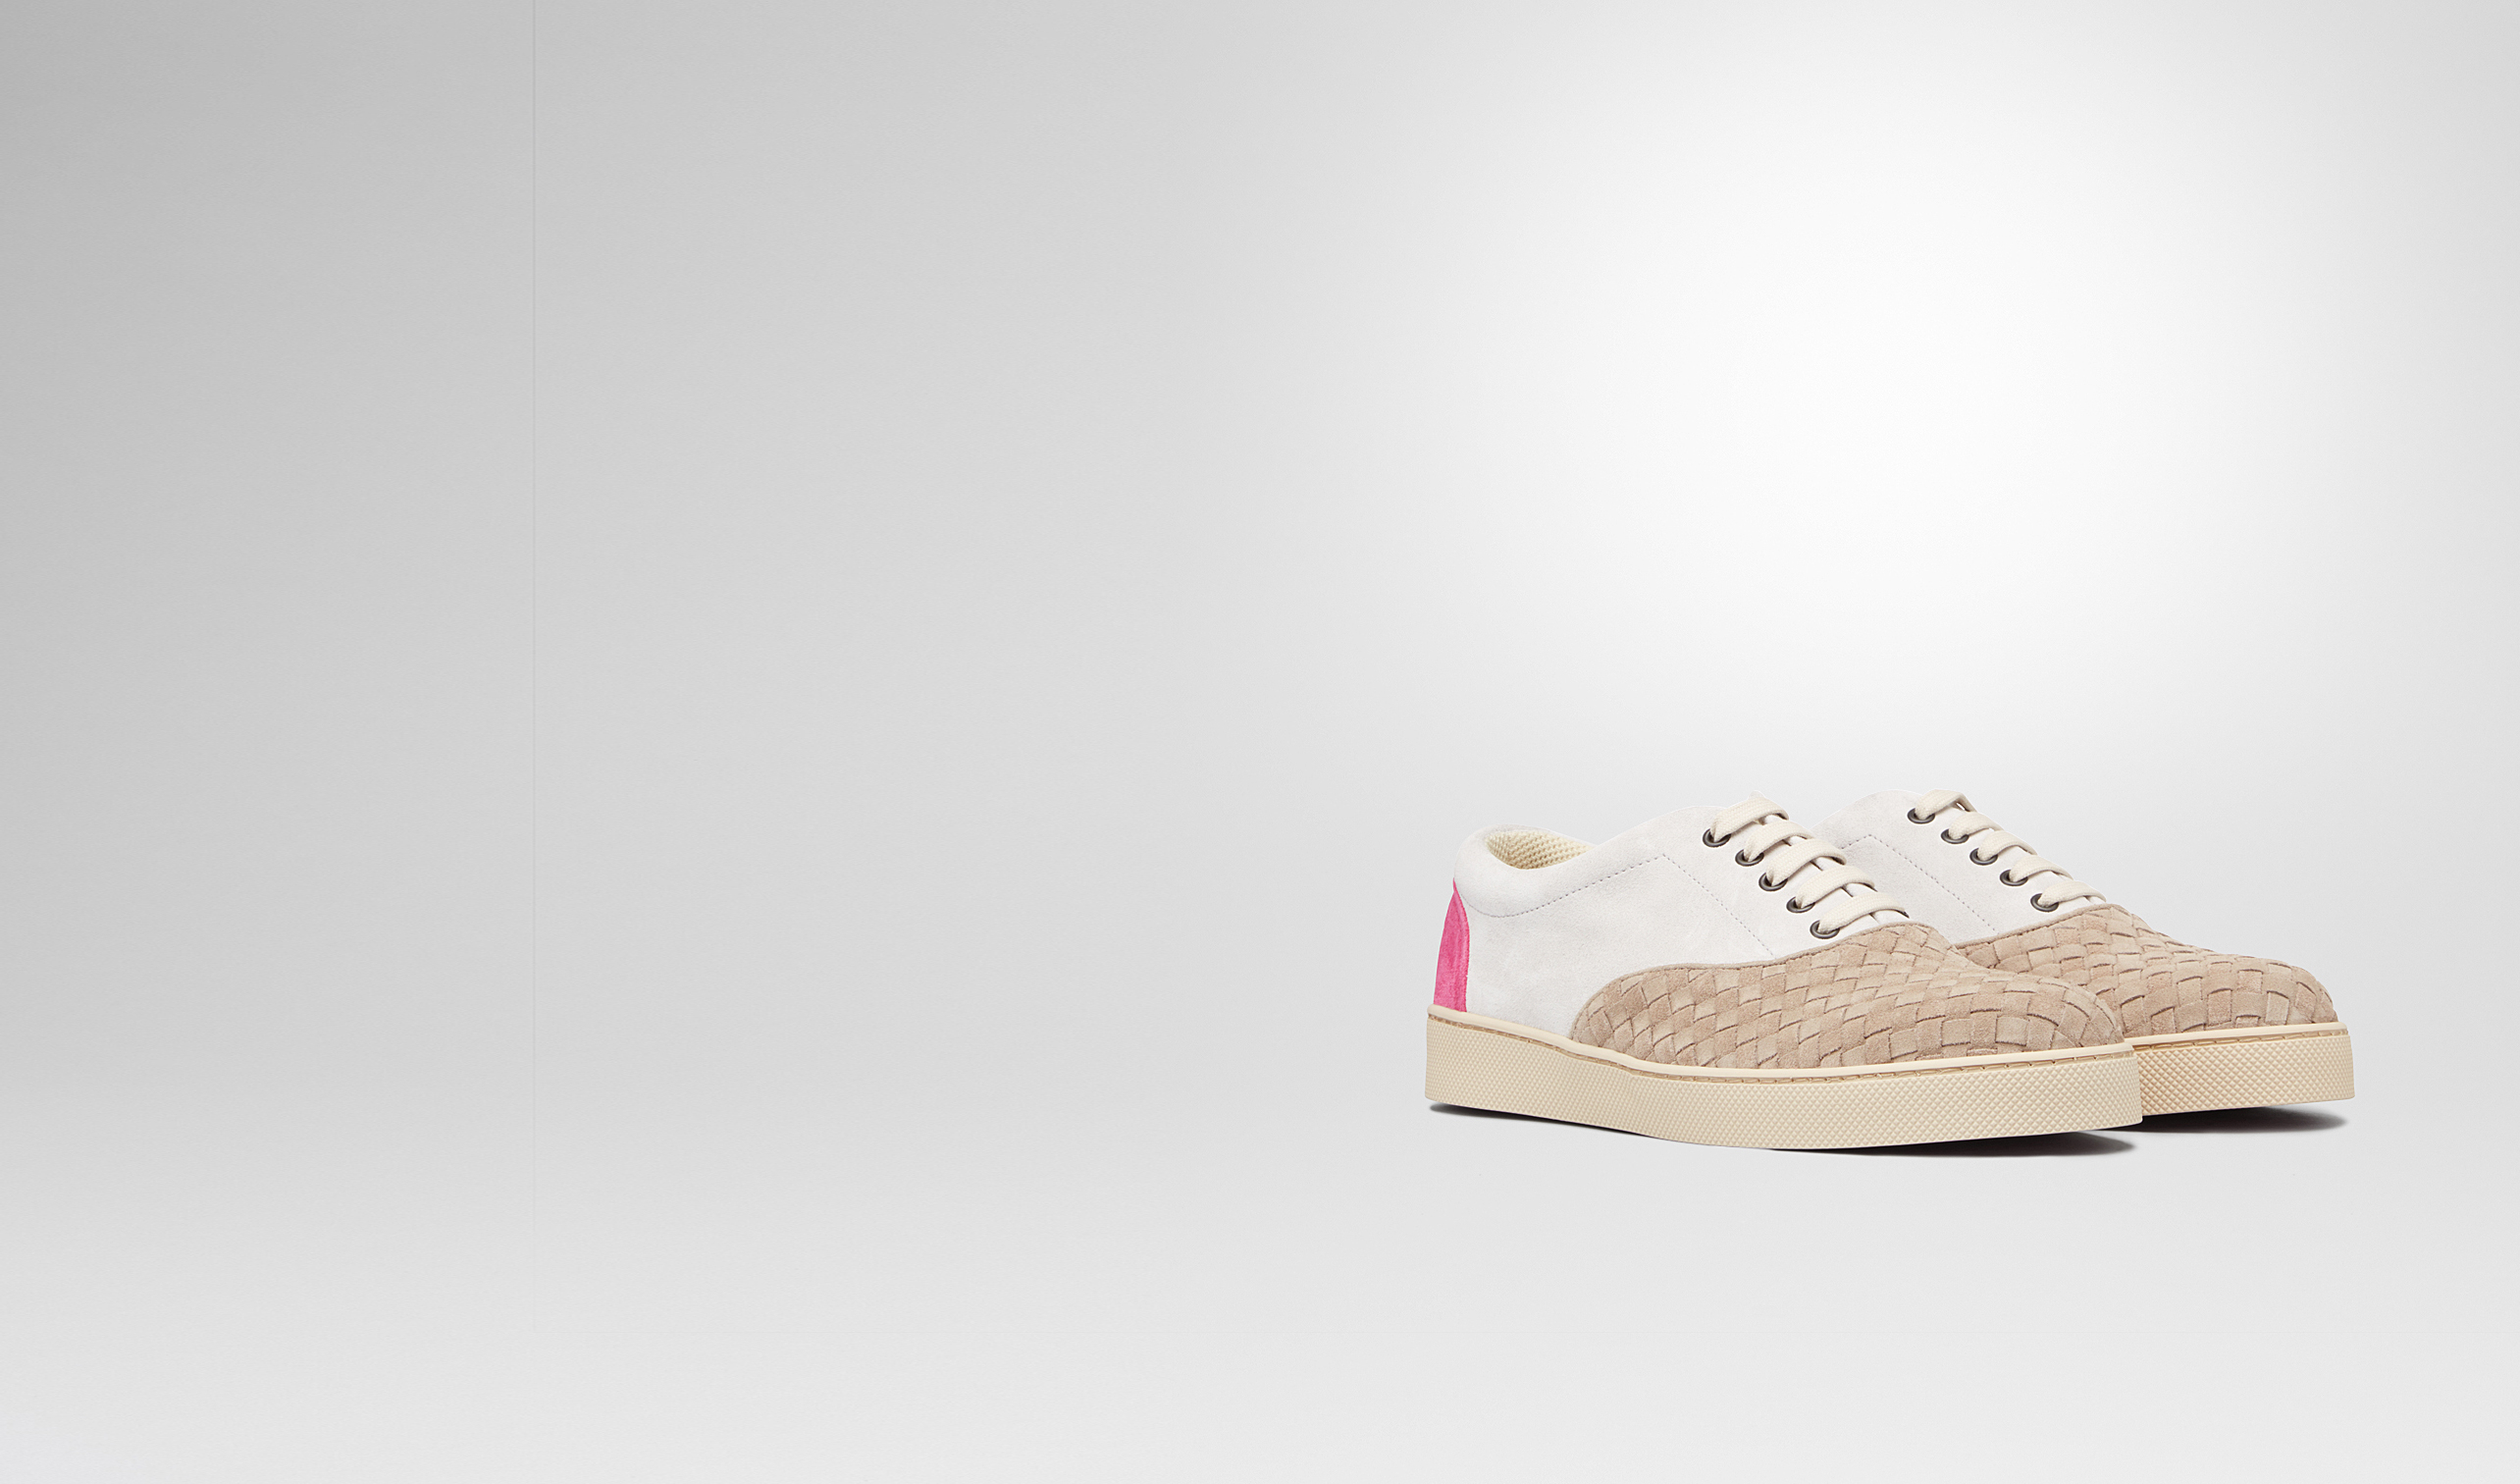 BOTTEGA VENETA Sneakers U Sand Mist Rosa Shock Intrecciato Suede Sneaker pl